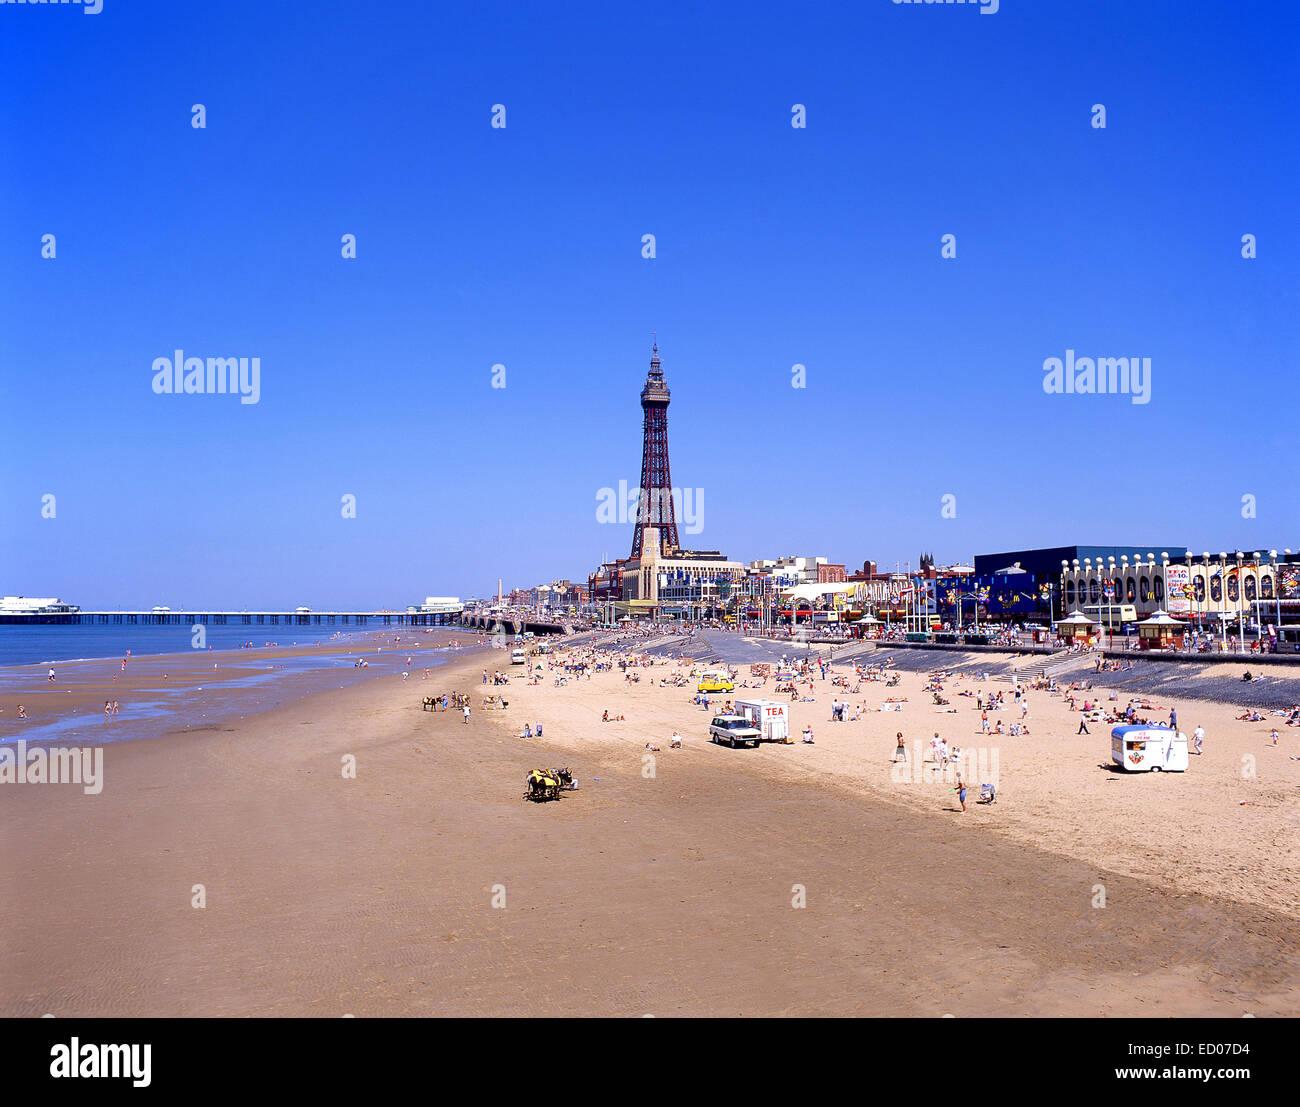 Blackpool Sands showing Blackpool Tower, Blackpool, Lancashire, England, United Kingdom - Stock Image